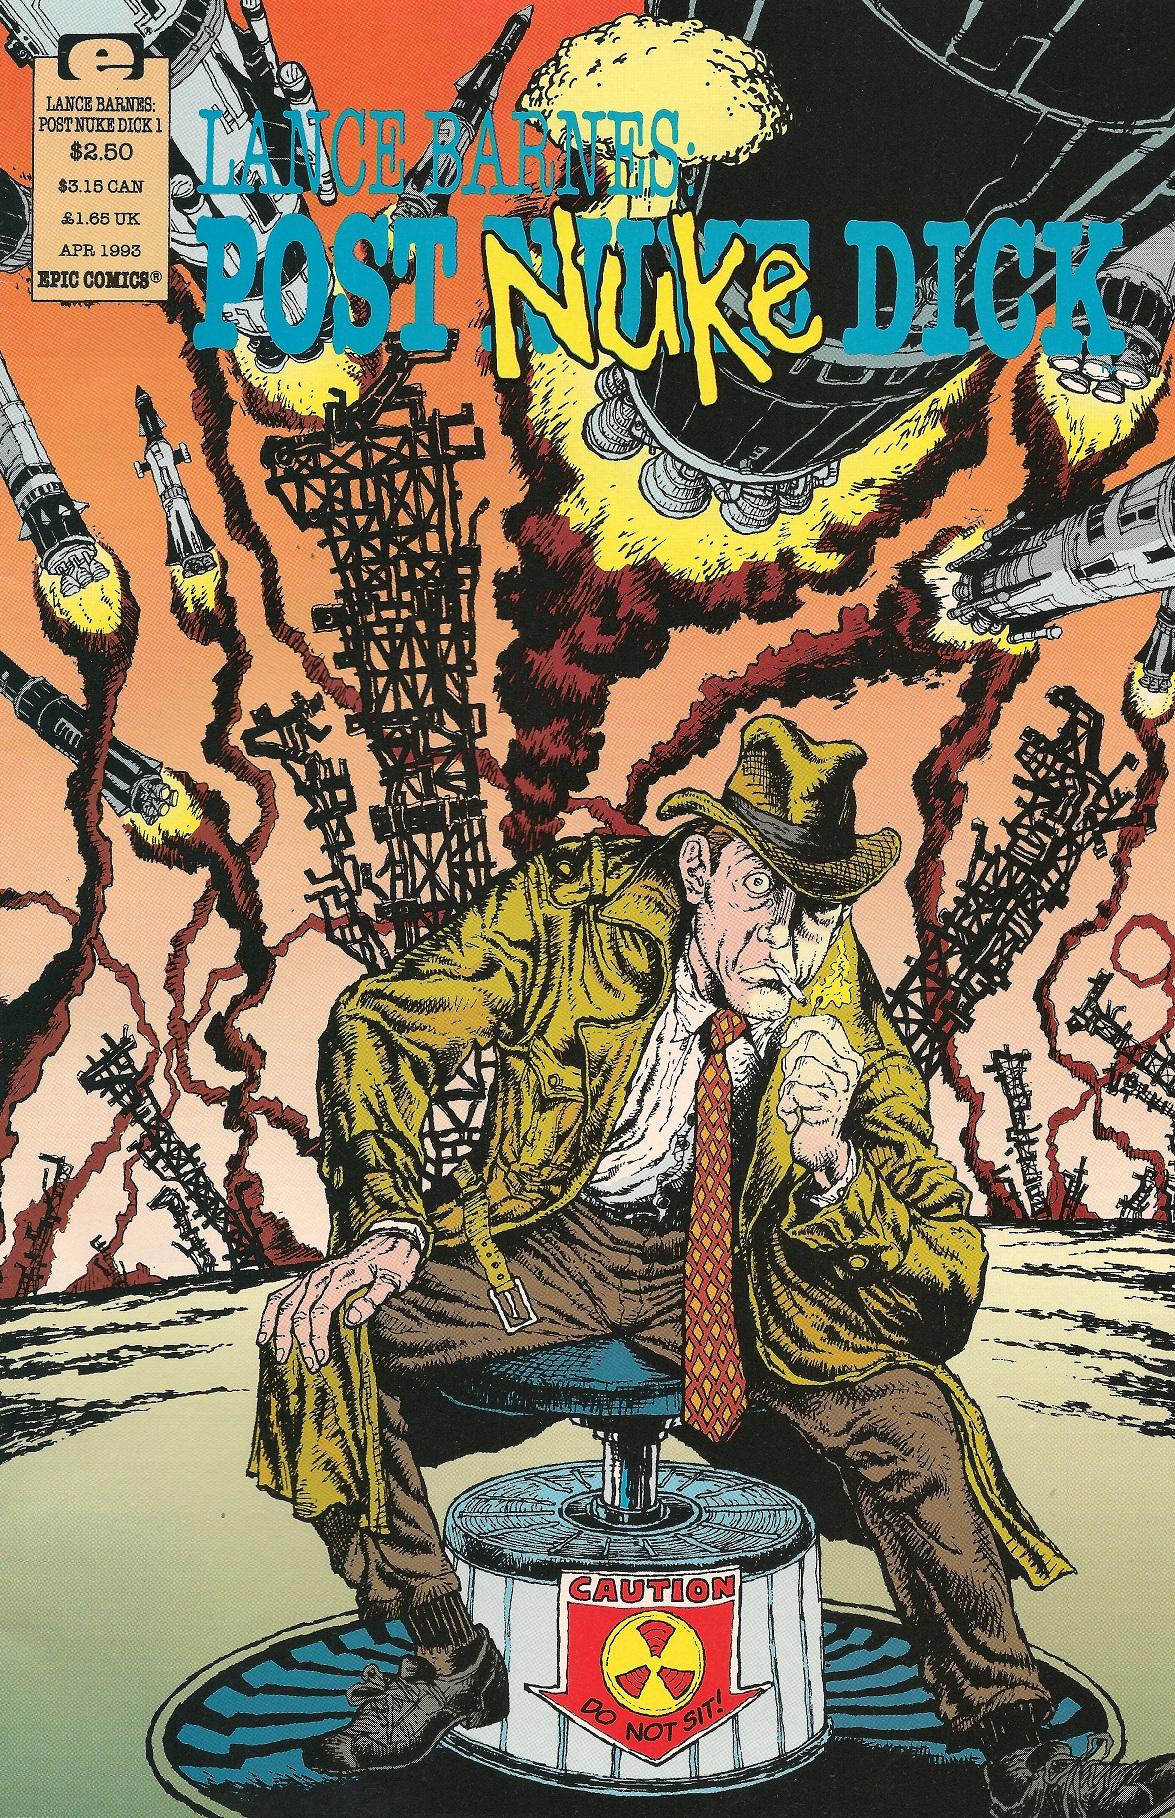 Lance Barnes: Post Nuke Dick Vol 1 1